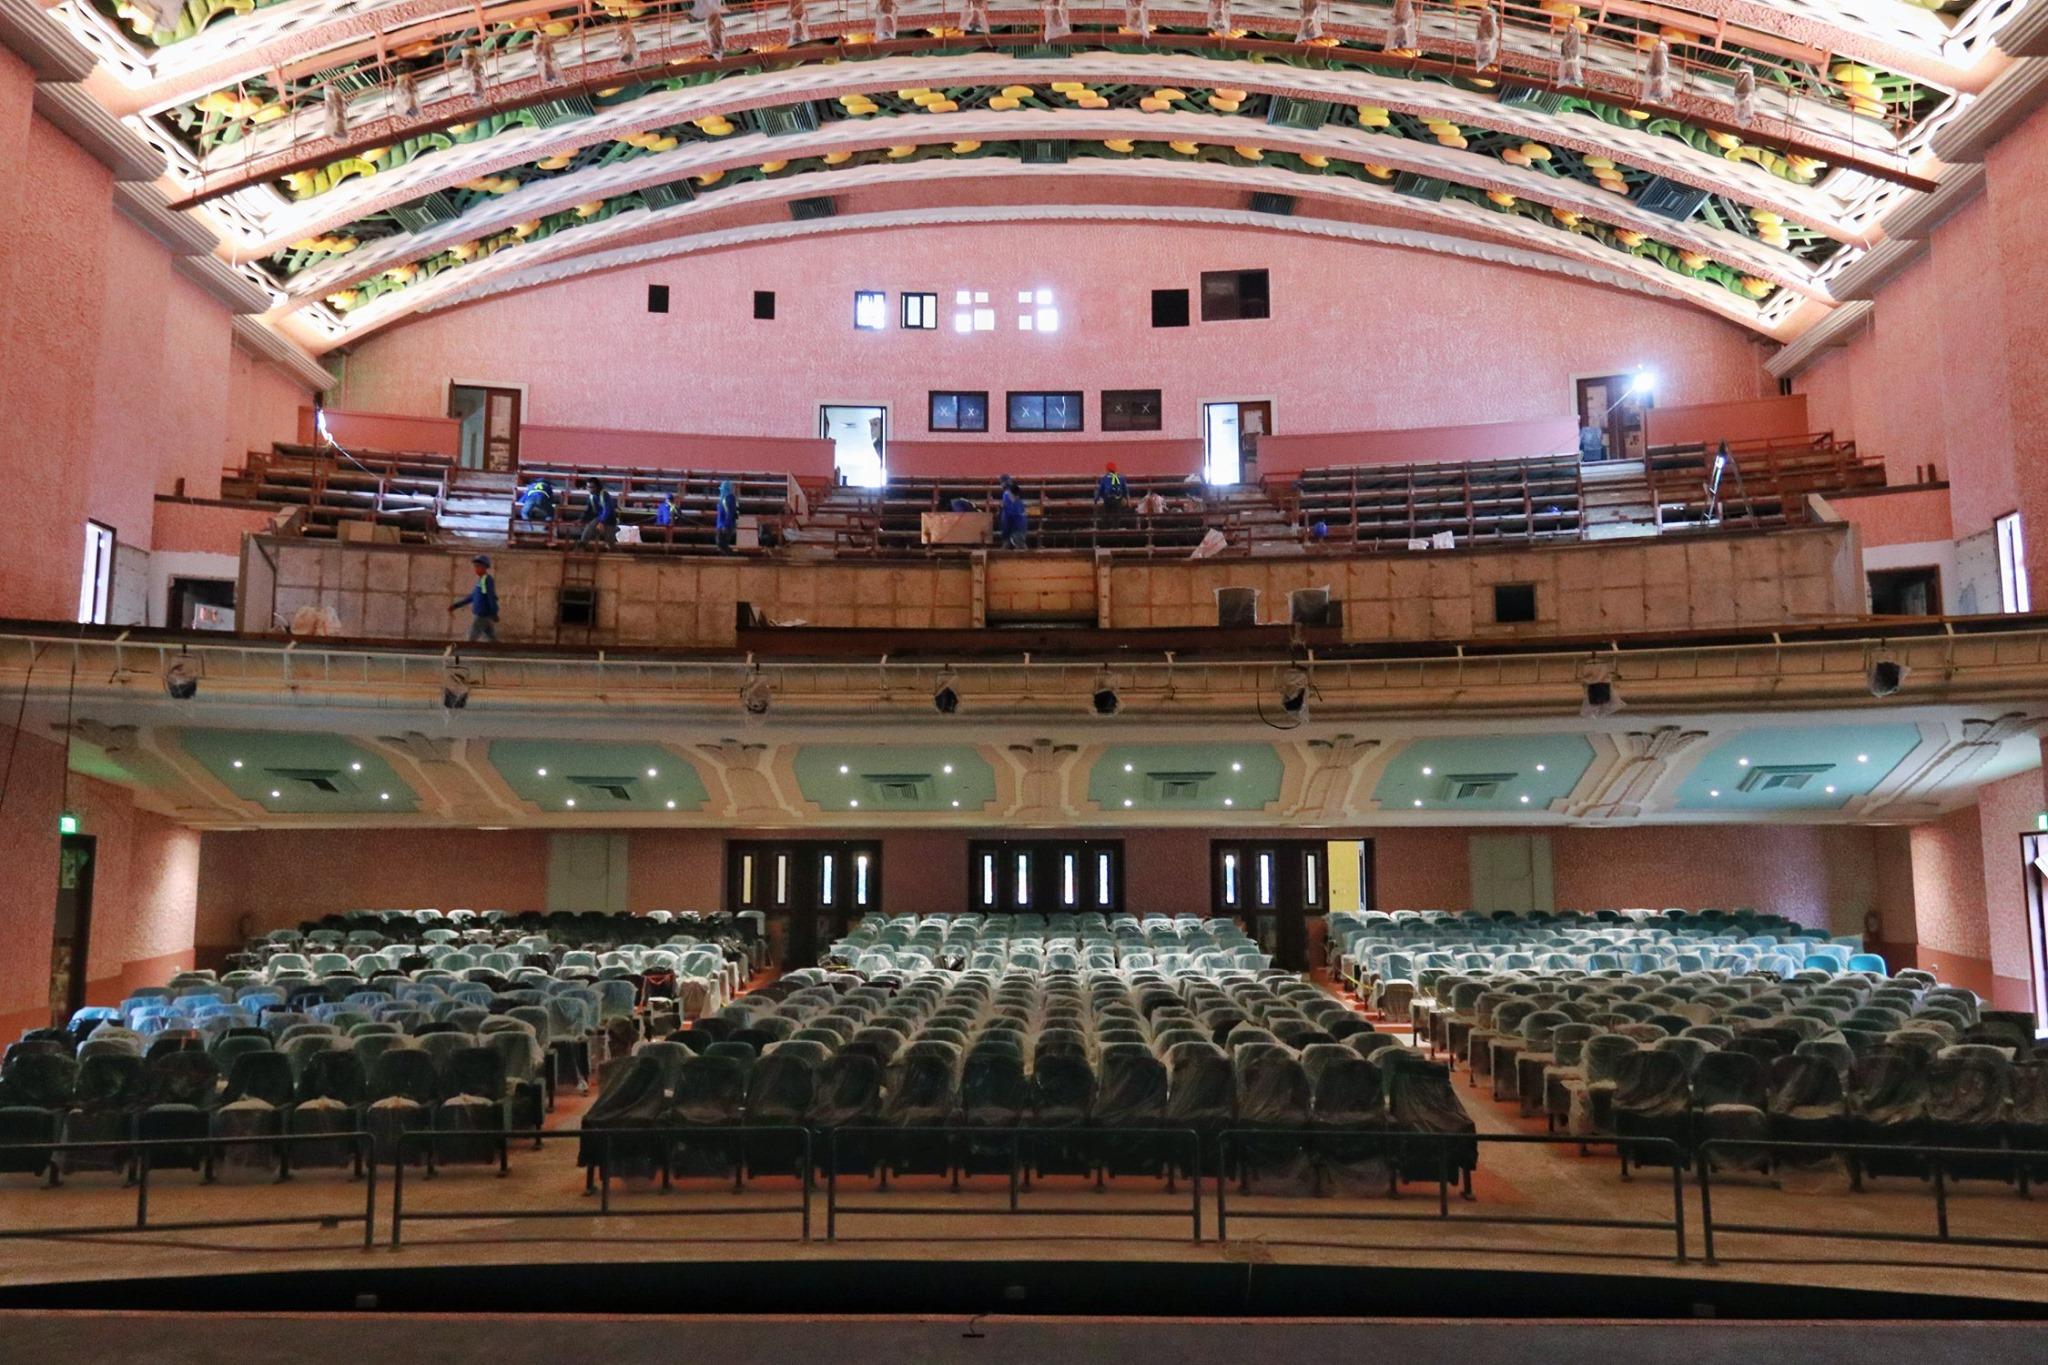 Photo Newly Restored Manila Metropolitan Theater Before It's 2021 Opening